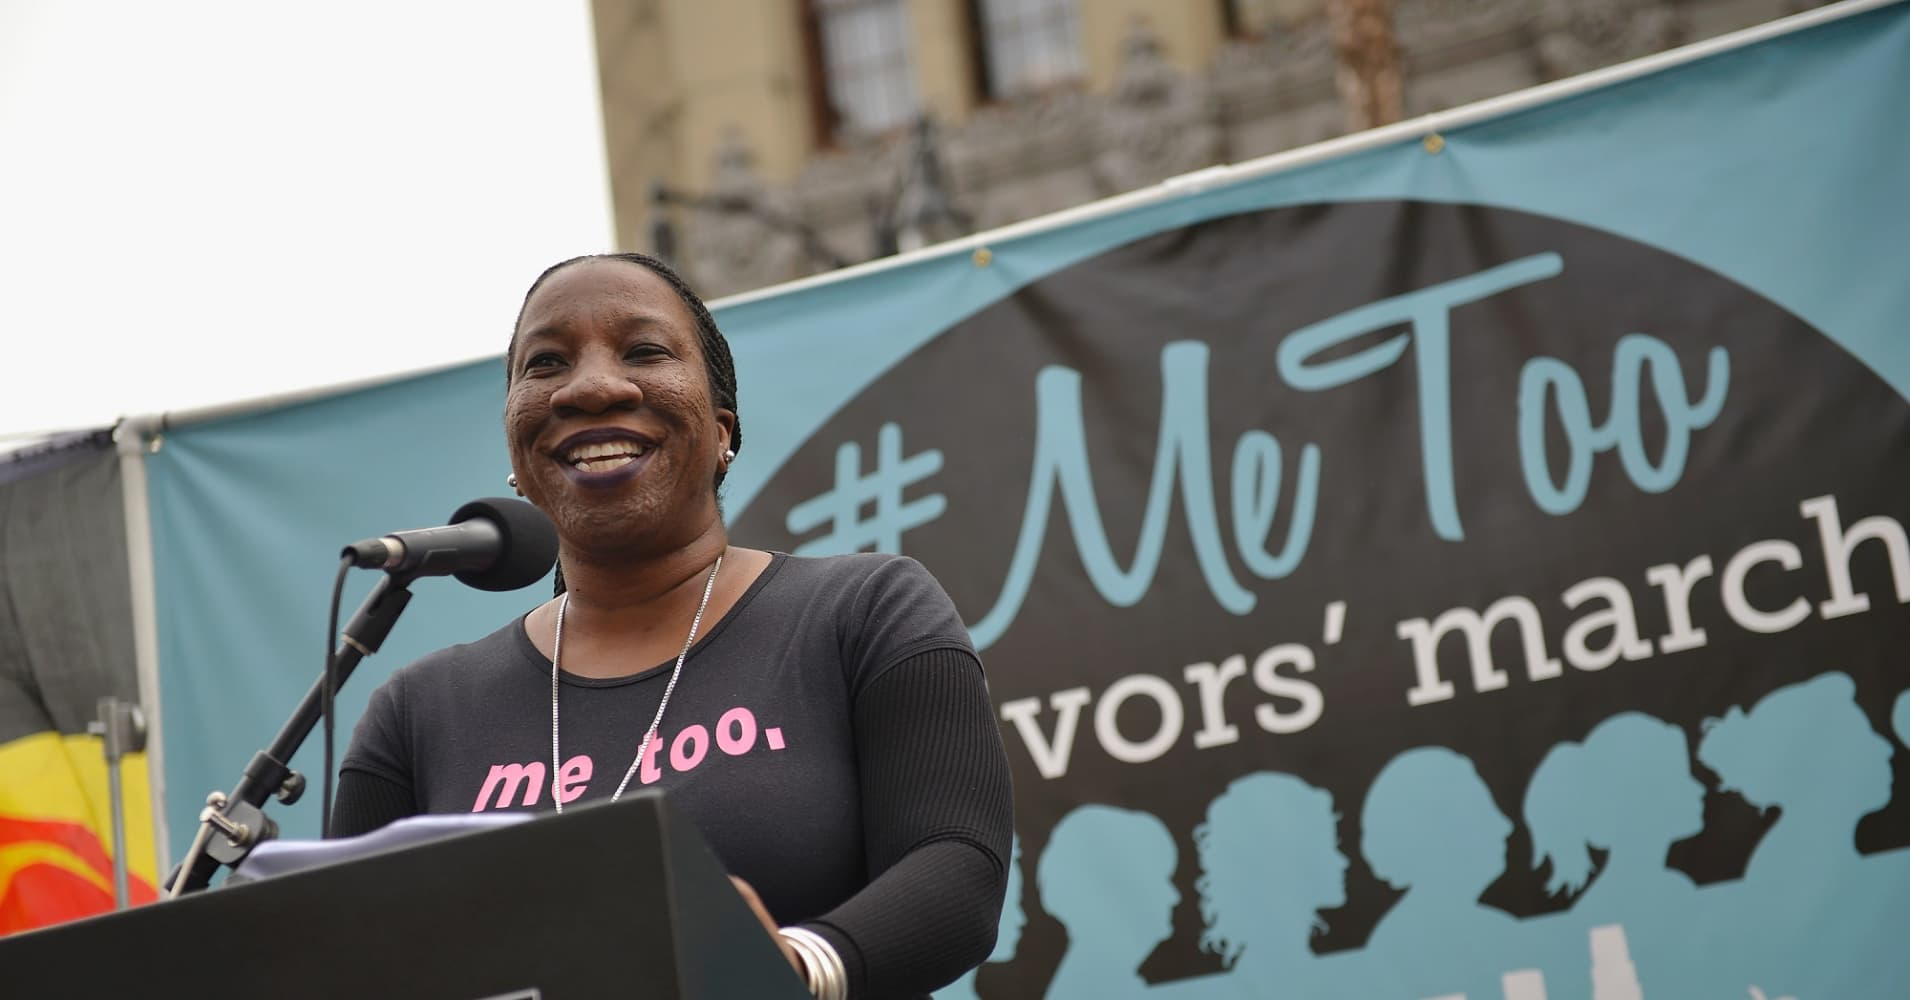 #MeToo founder Tarana Burke has big plans for the movement ...